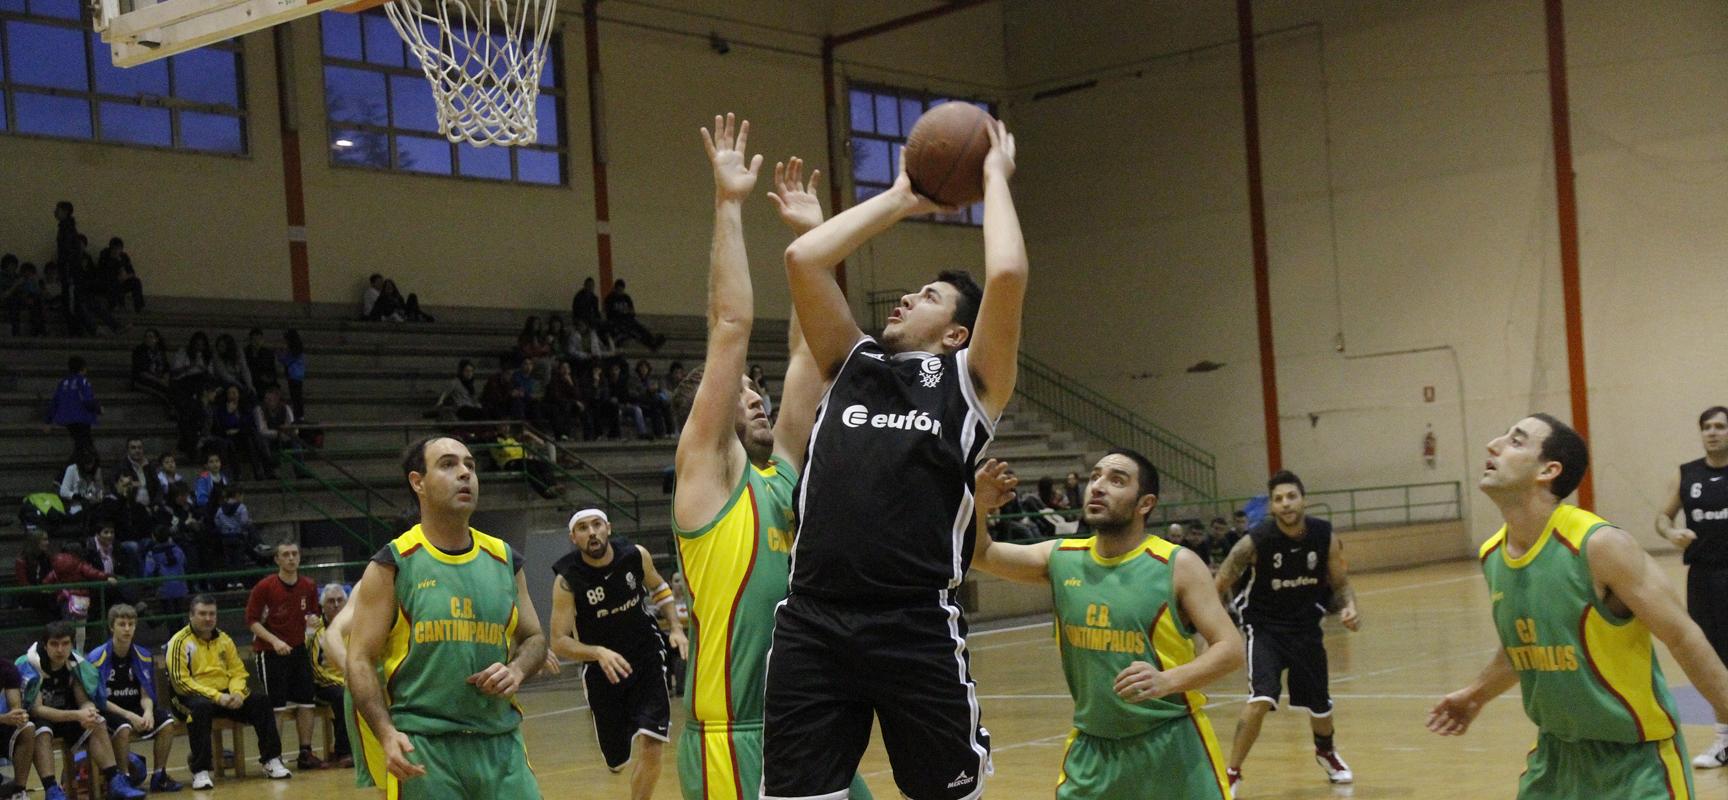 deporte-baloncesto-Cuéllar-polideportivo